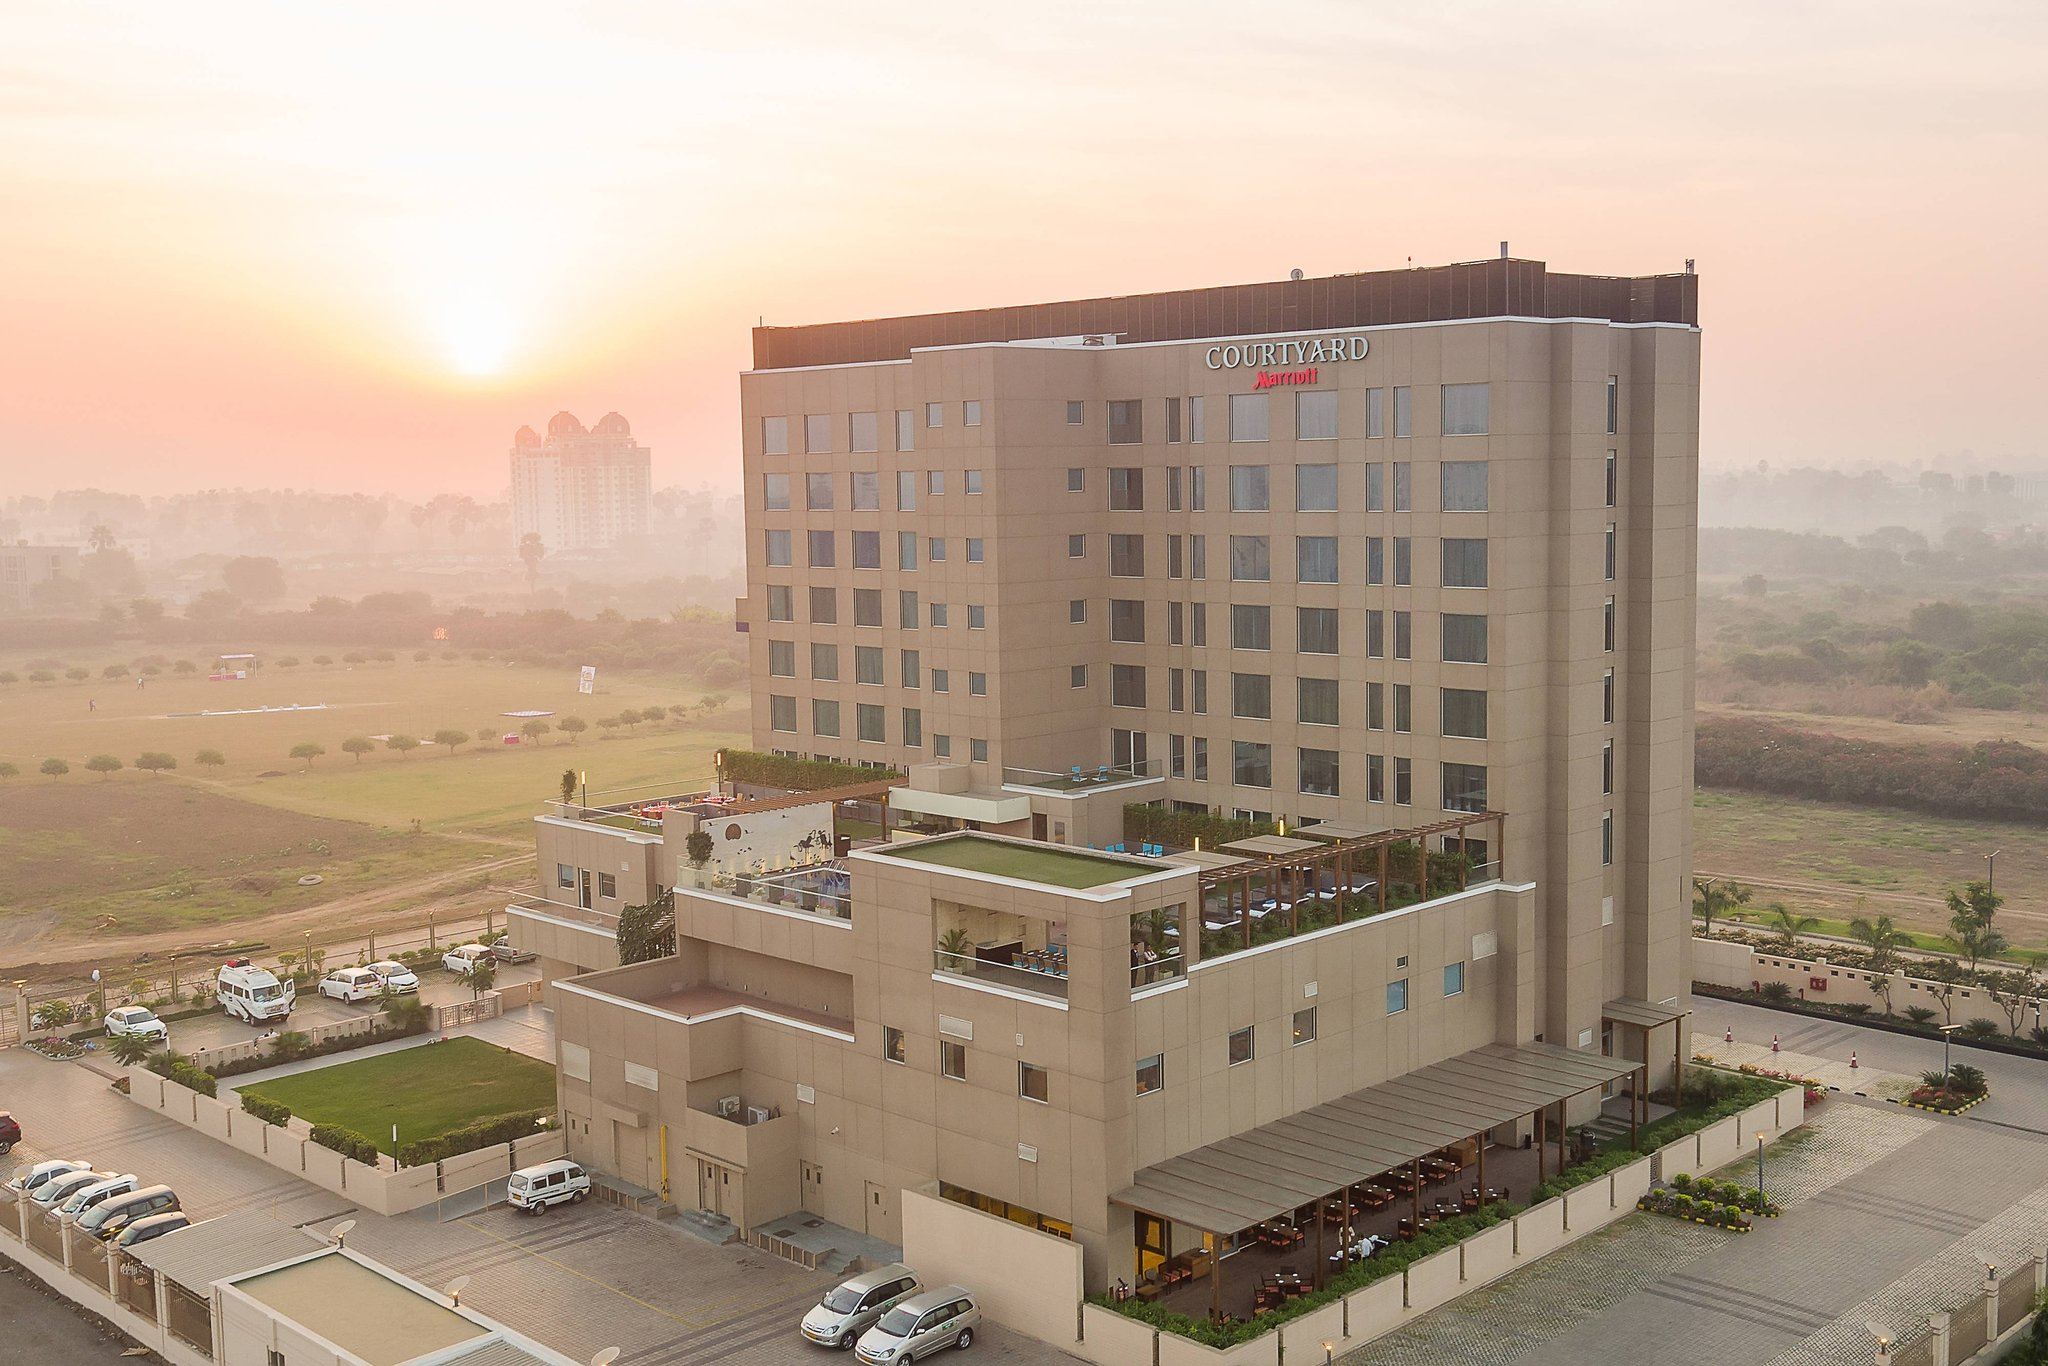 Courtyard by Marriott Surat